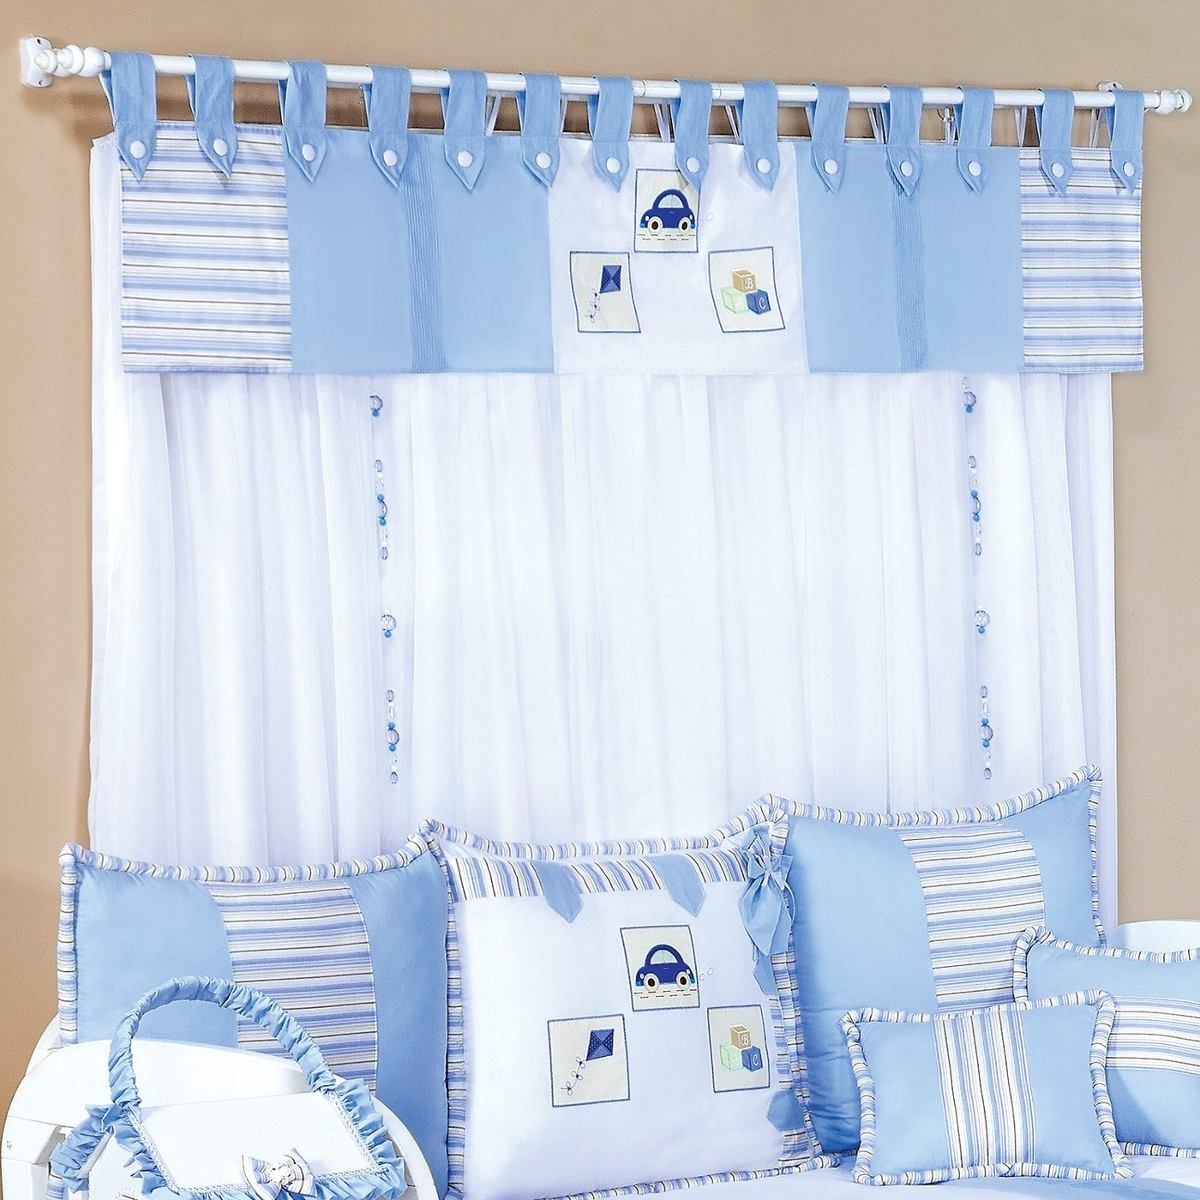 Cortina para quarto de beb menino conforto divers o 7 p - Modelos de cortinas infantiles ...